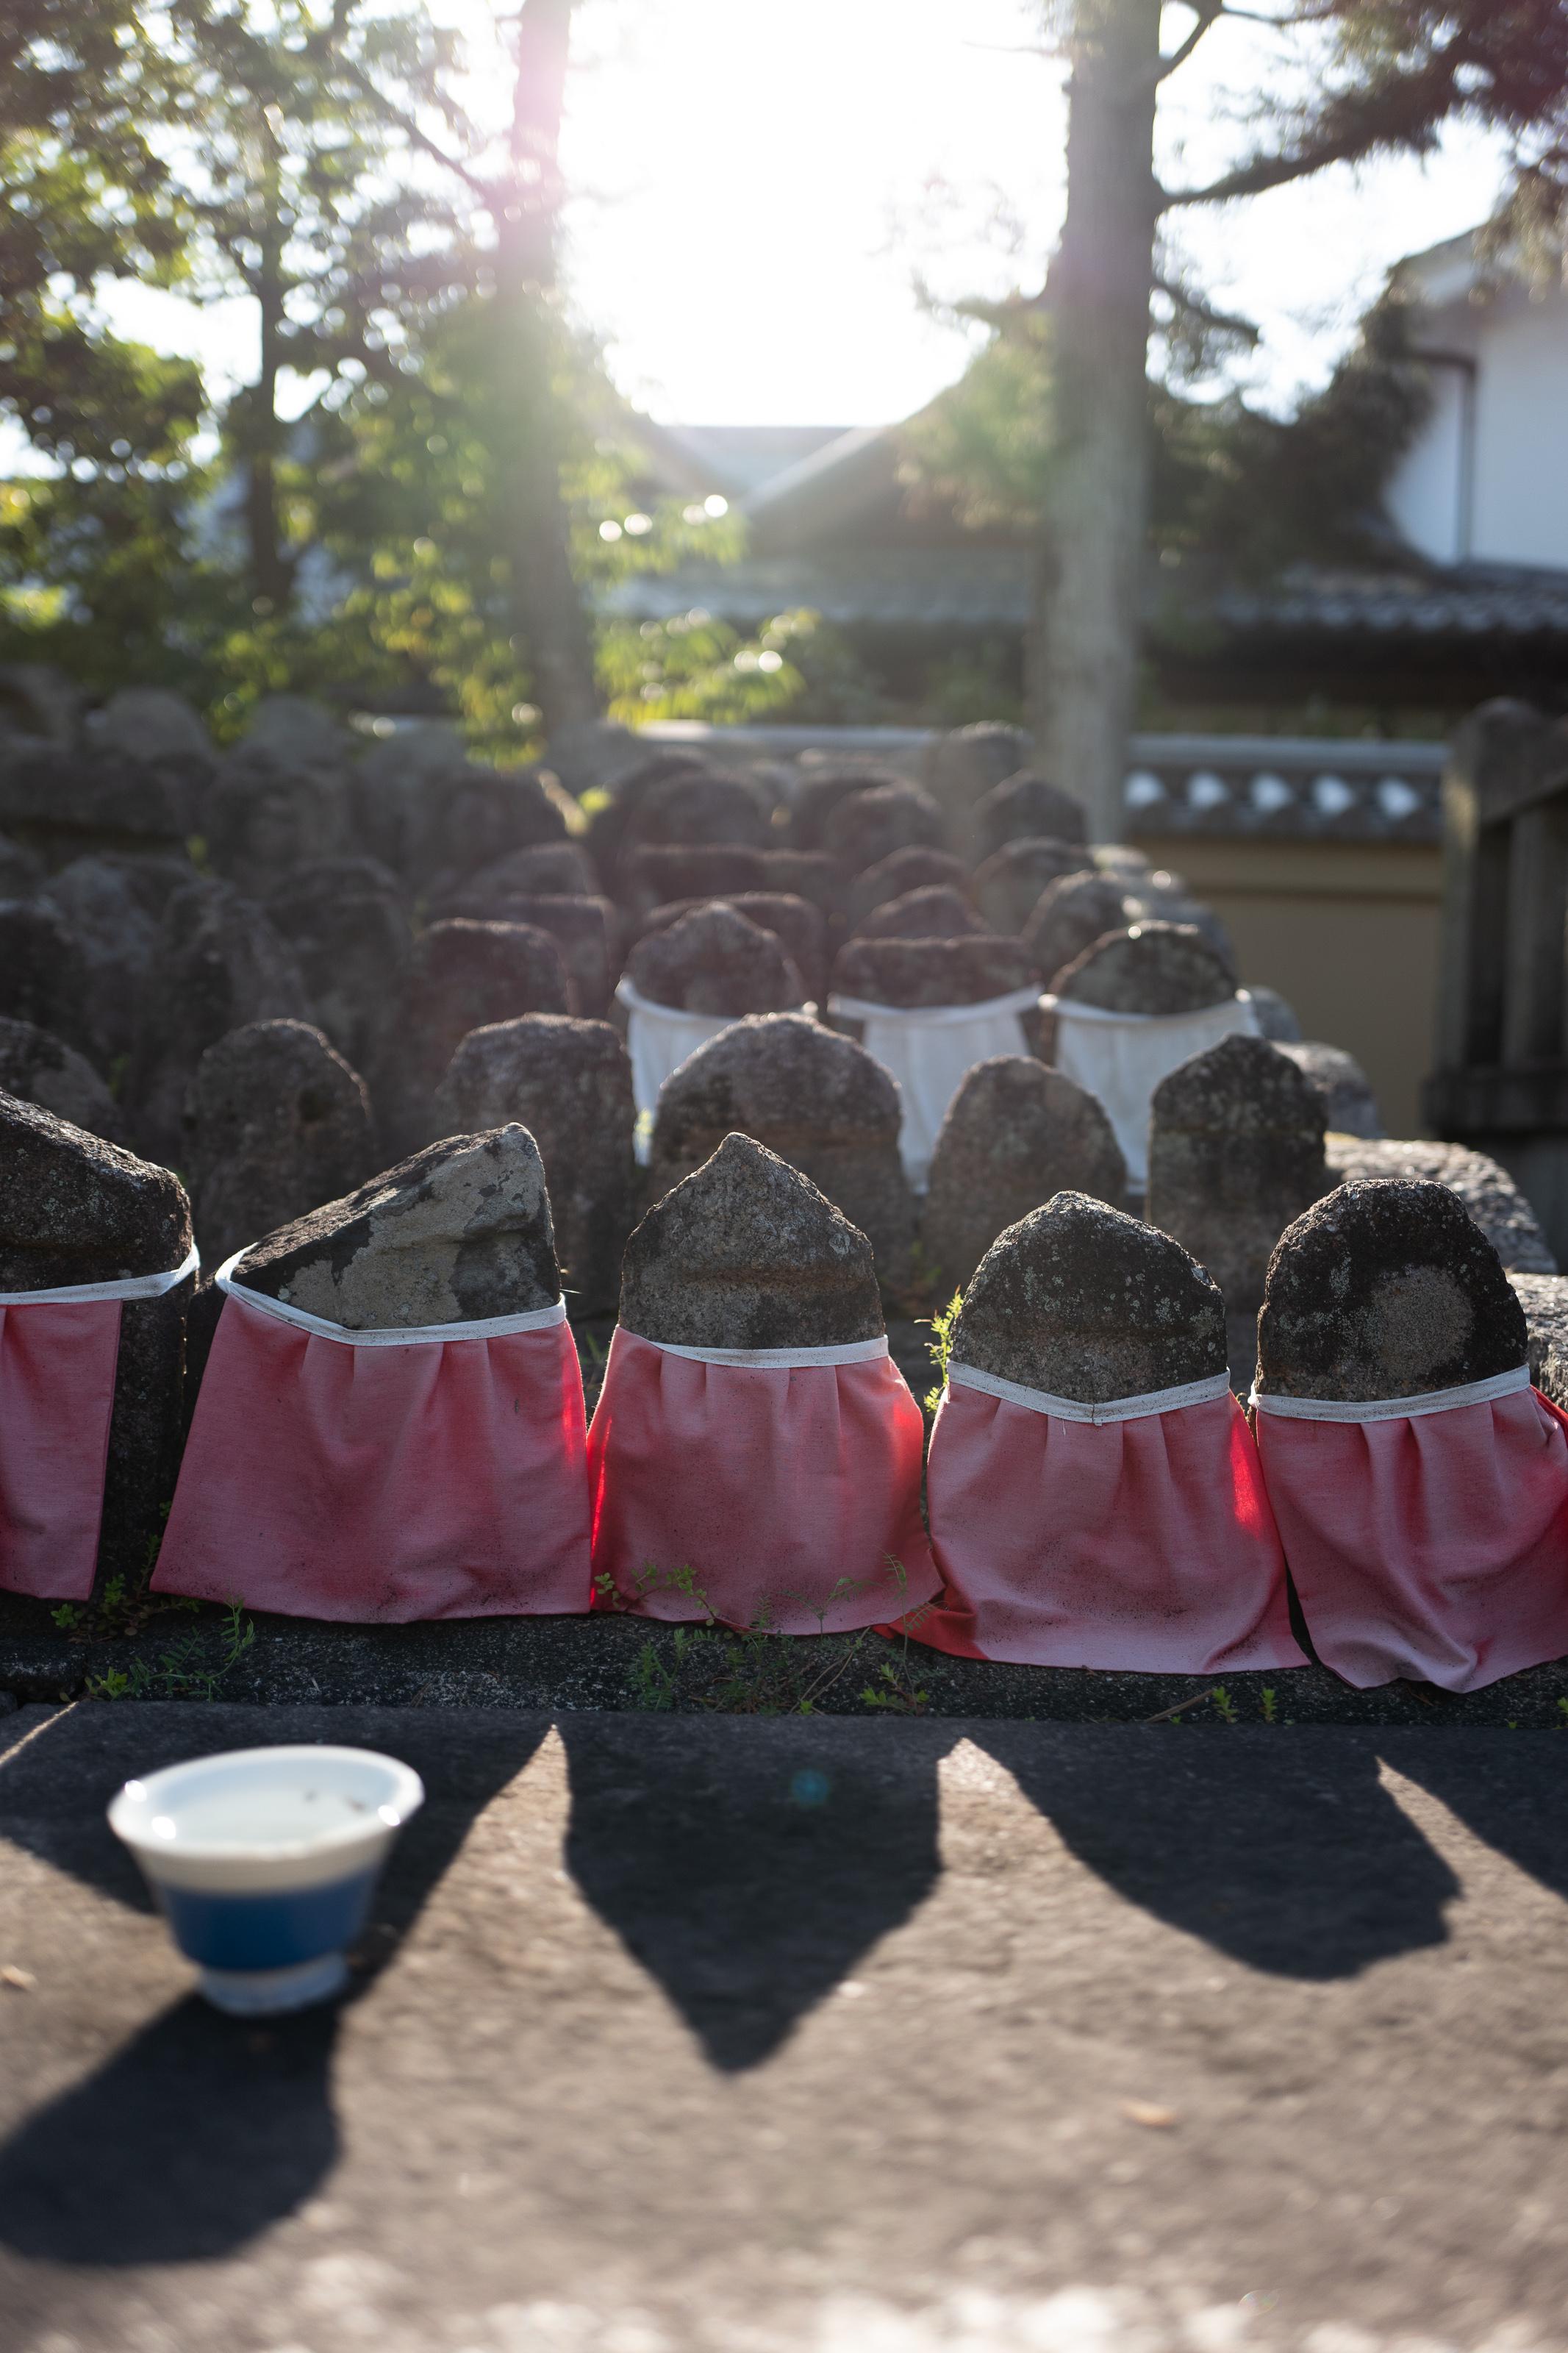 Jizo statues in Daitokuji Temple